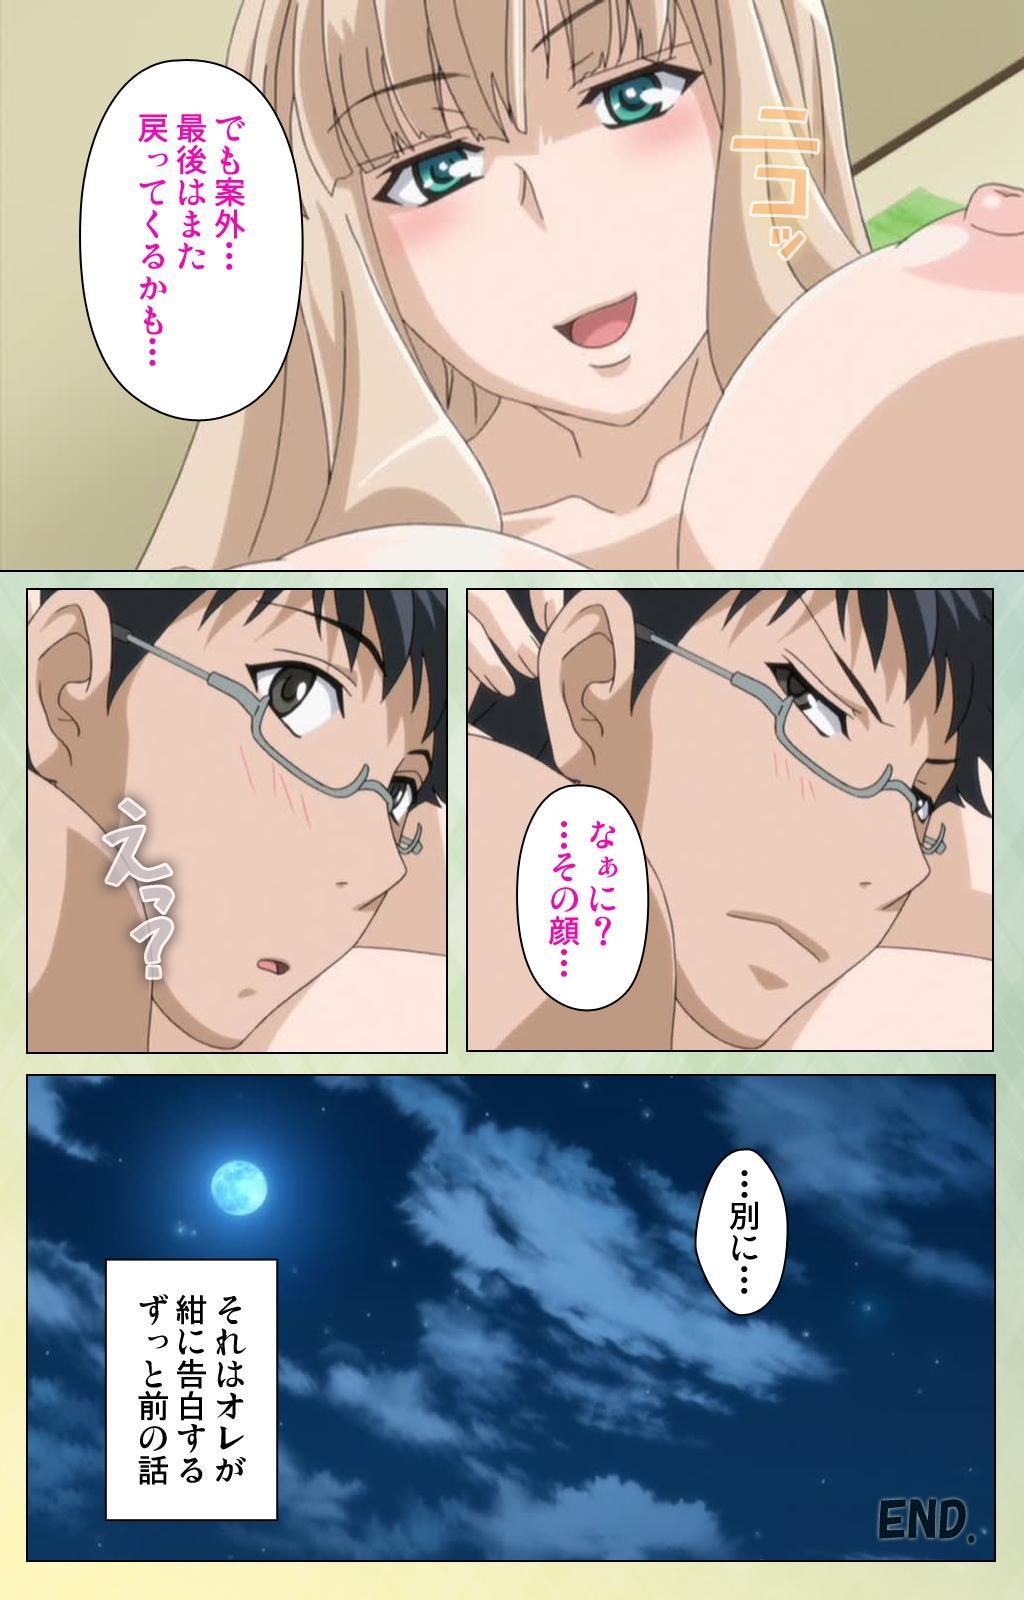 Furueru Kuchibiru fuzzy lips0 Complete Ban 91